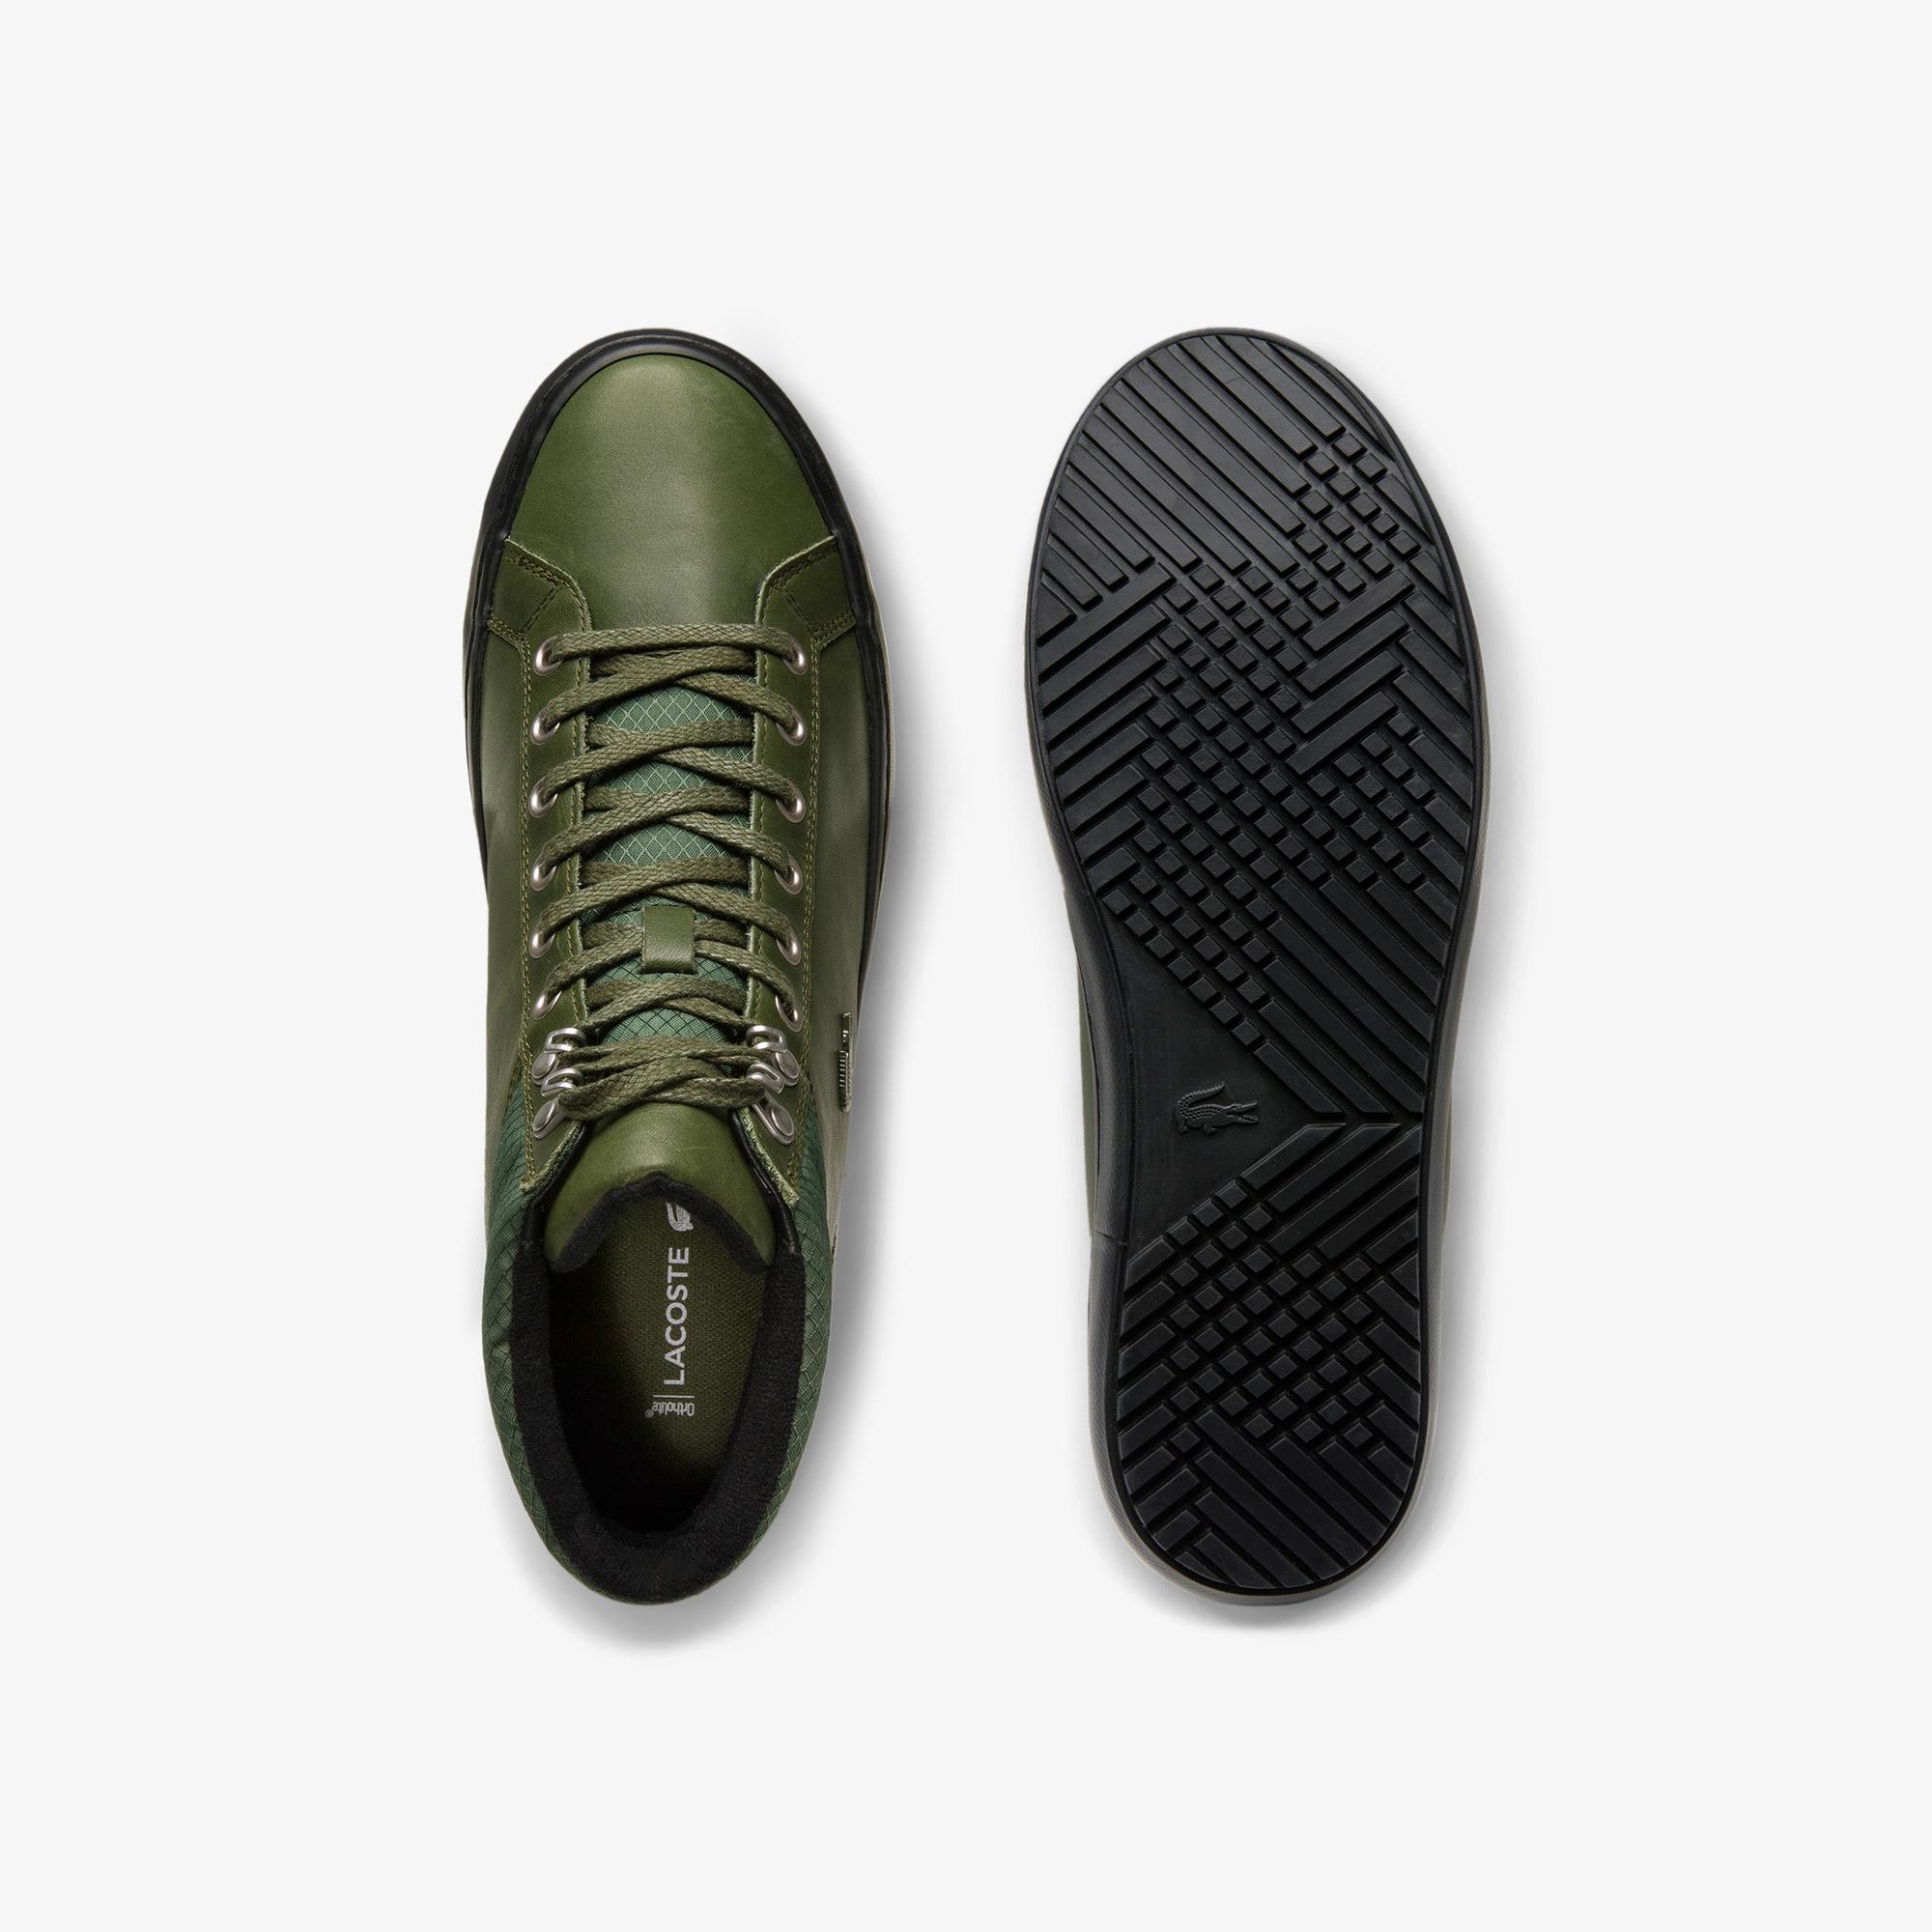 Lacoste черевики чоловічі Straightset Thermo